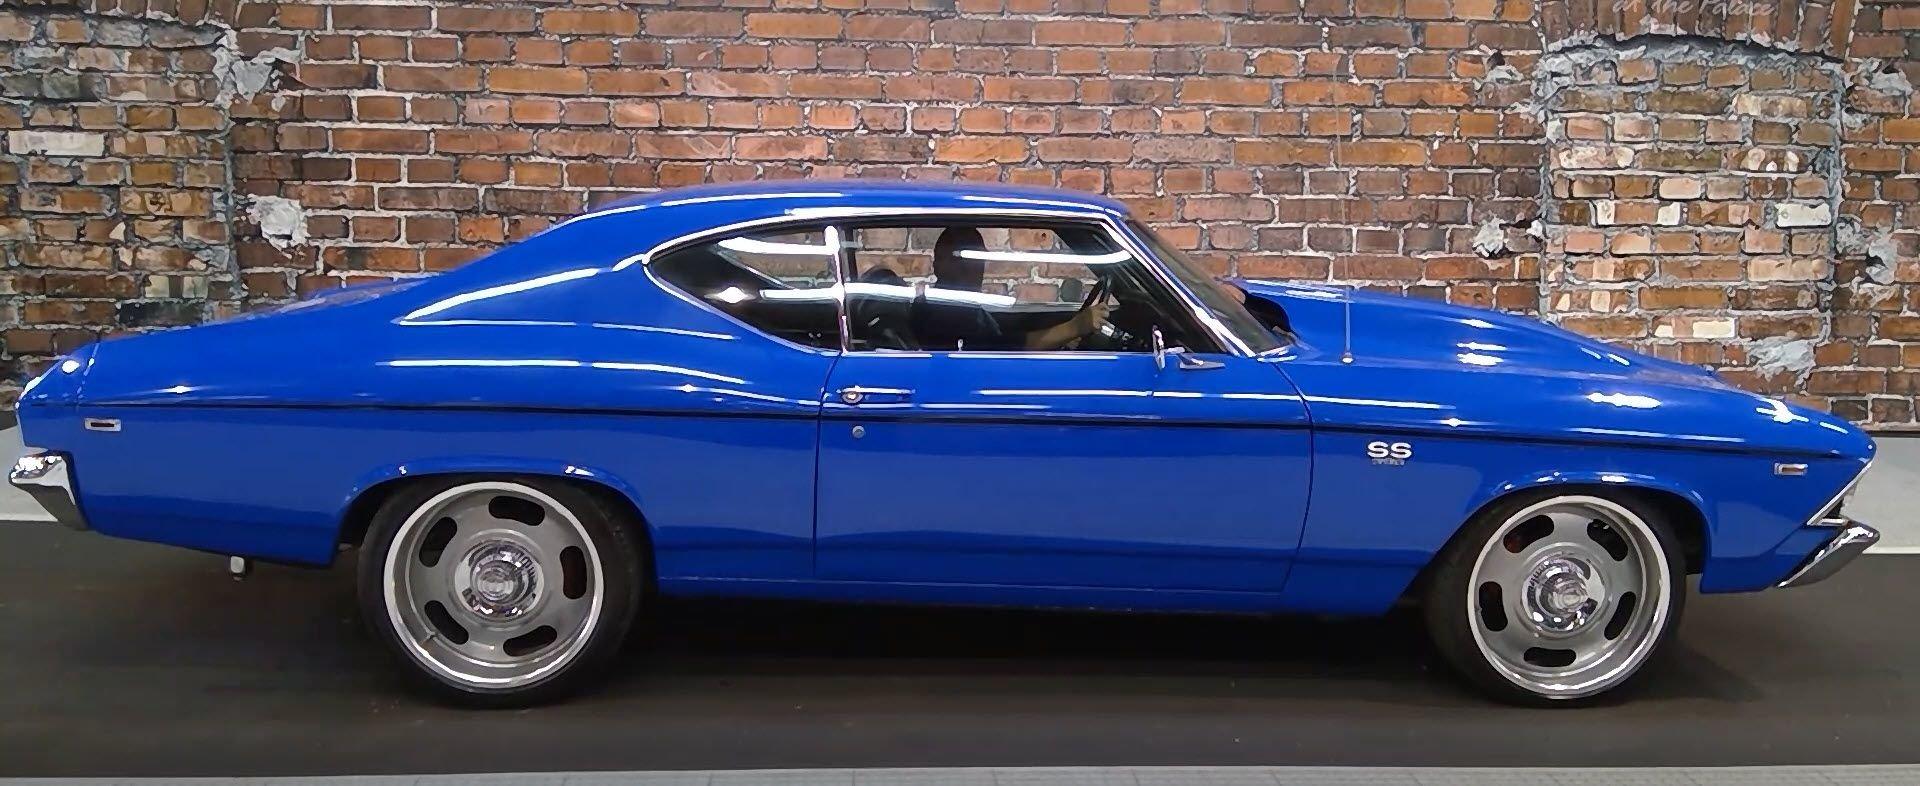 1969 Chevrolet Chevelle Gaa Classic Cars